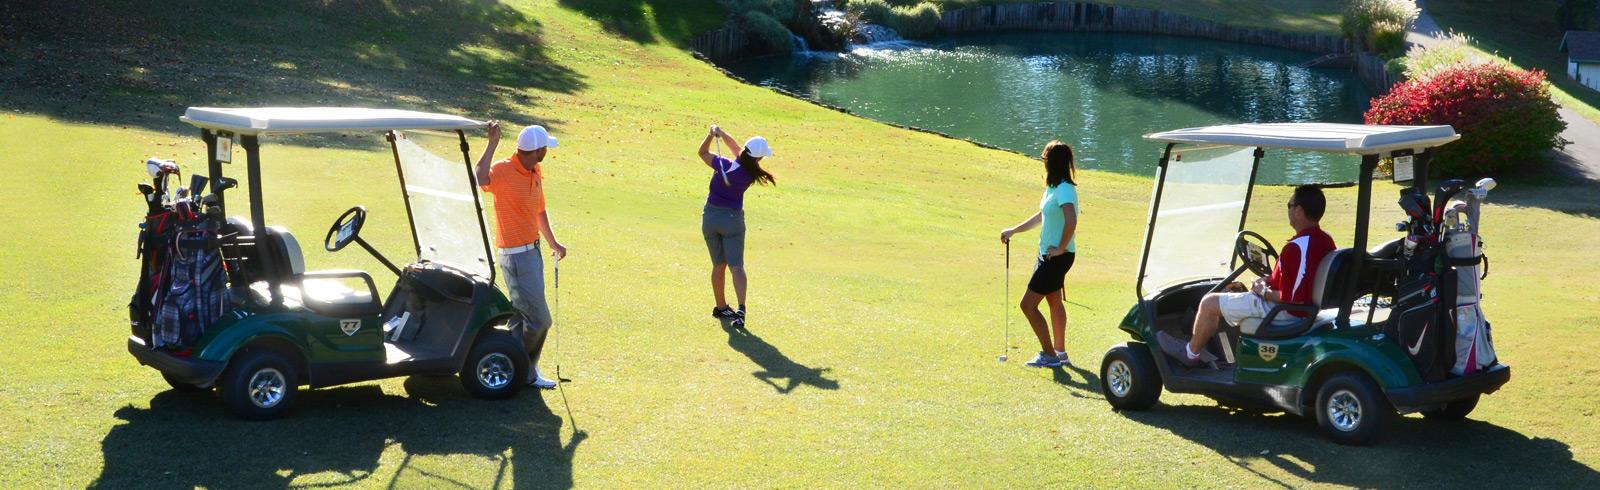 Play Tan-Tar-A Resort Golf Courses, Missouri